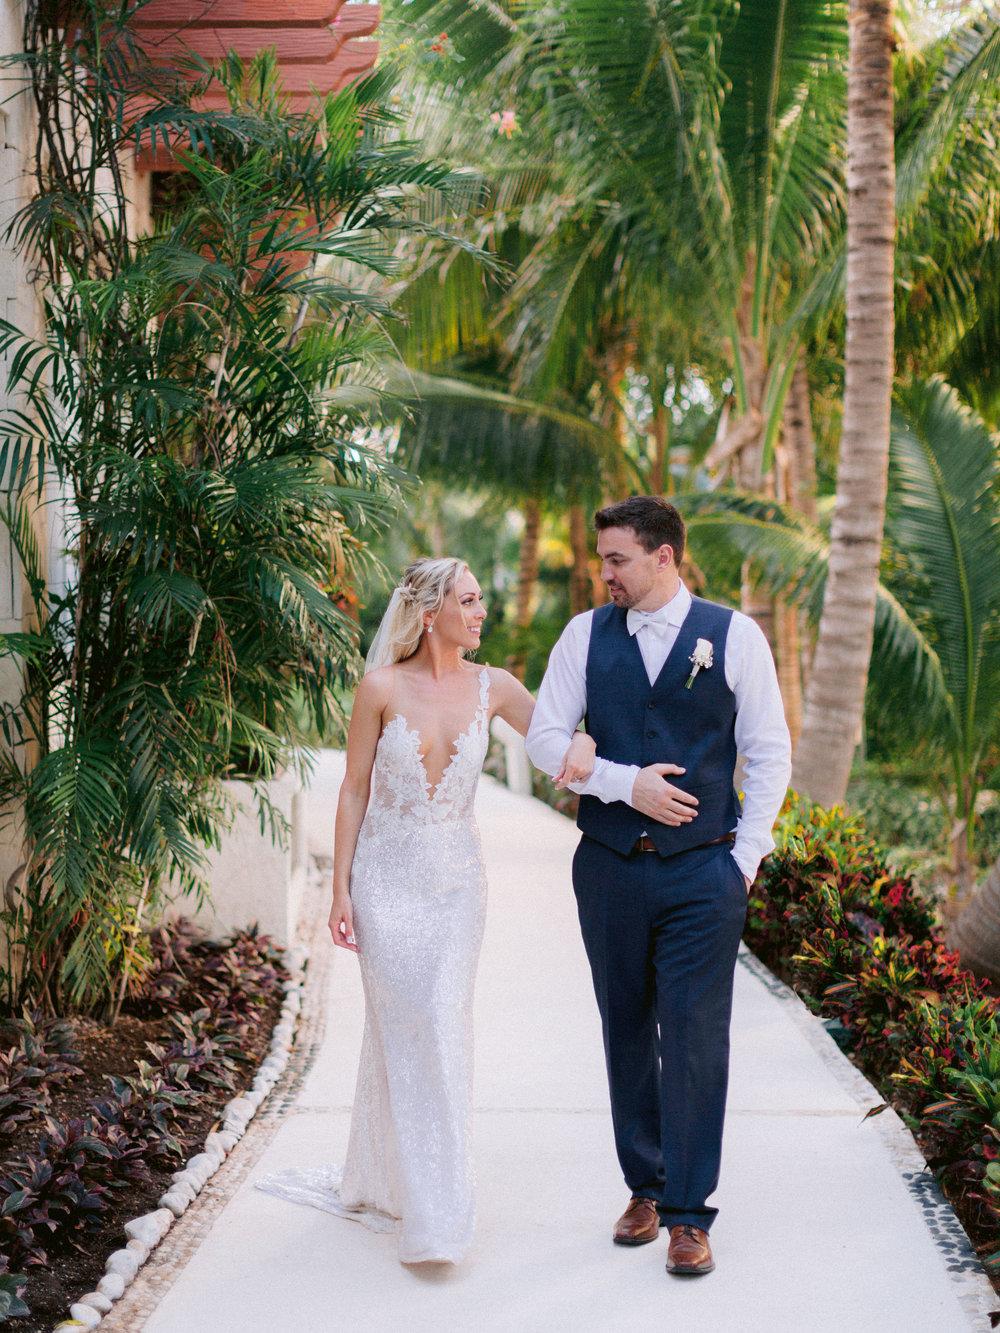 Kim_Jeff_Cancun Wedding_Portraits_Kurtz_Orpia (80 of 178).jpg